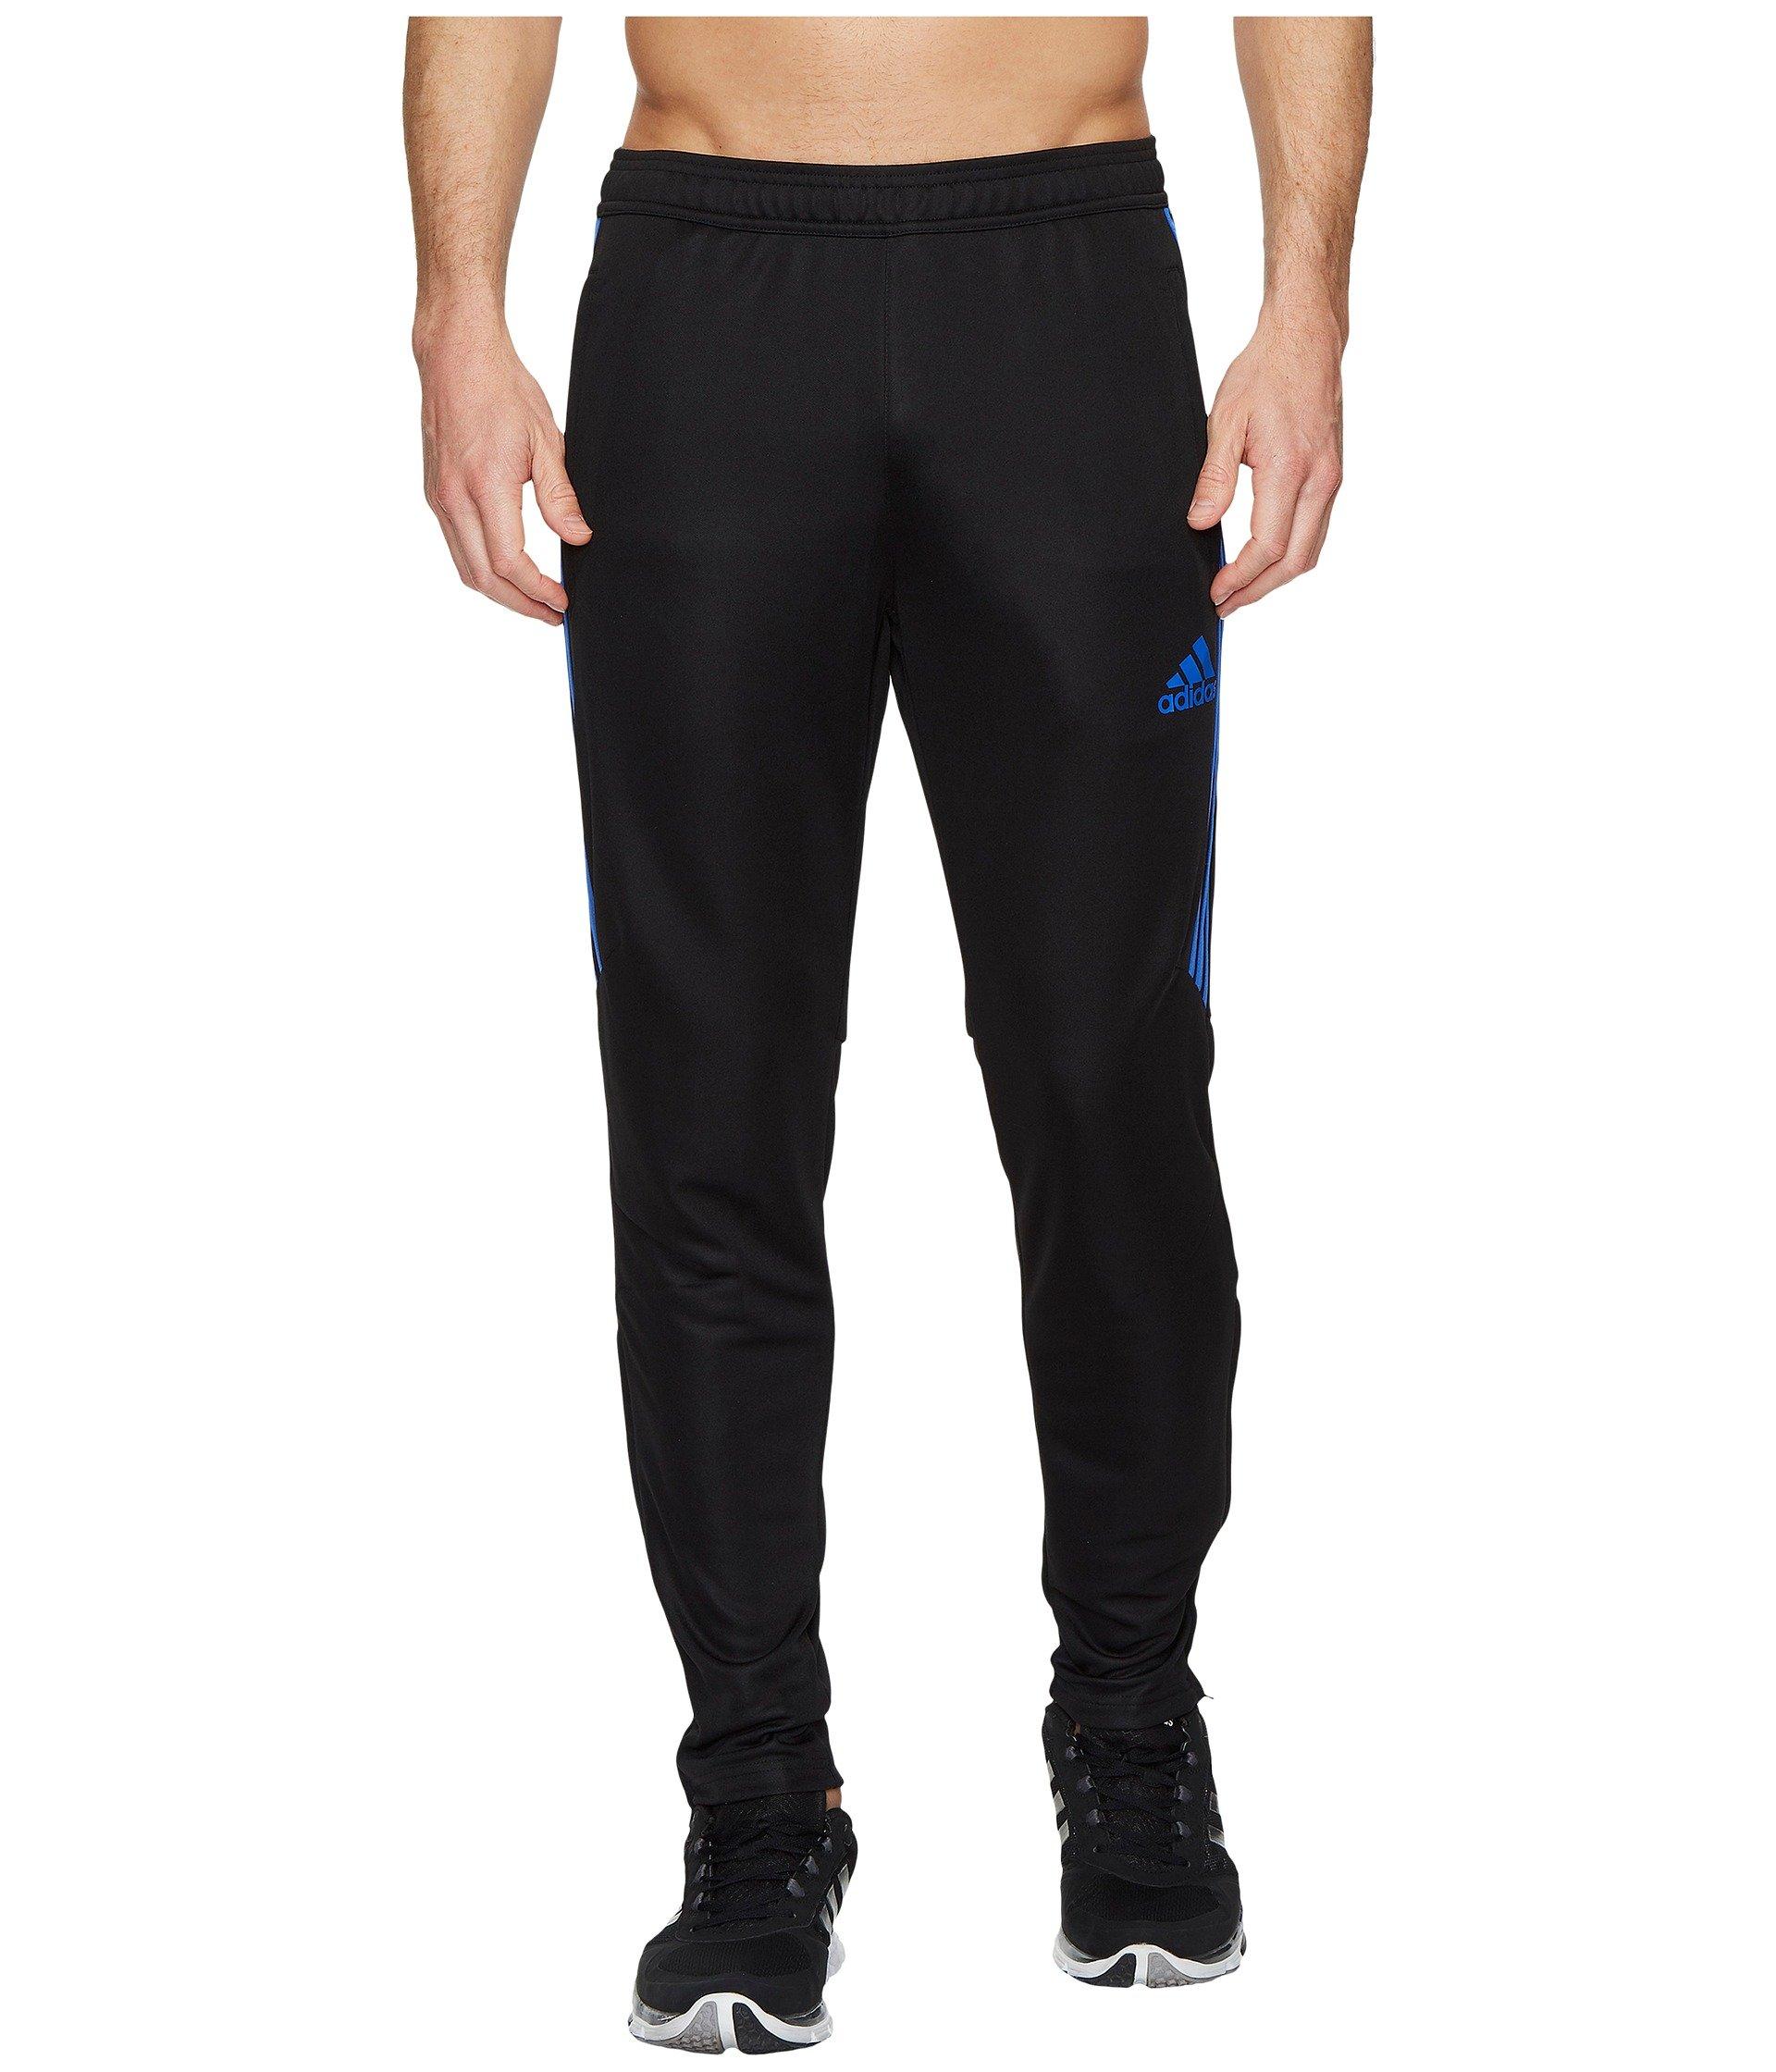 adidas Men's Tiro '17 Pants Black/High Res Blue Small 31